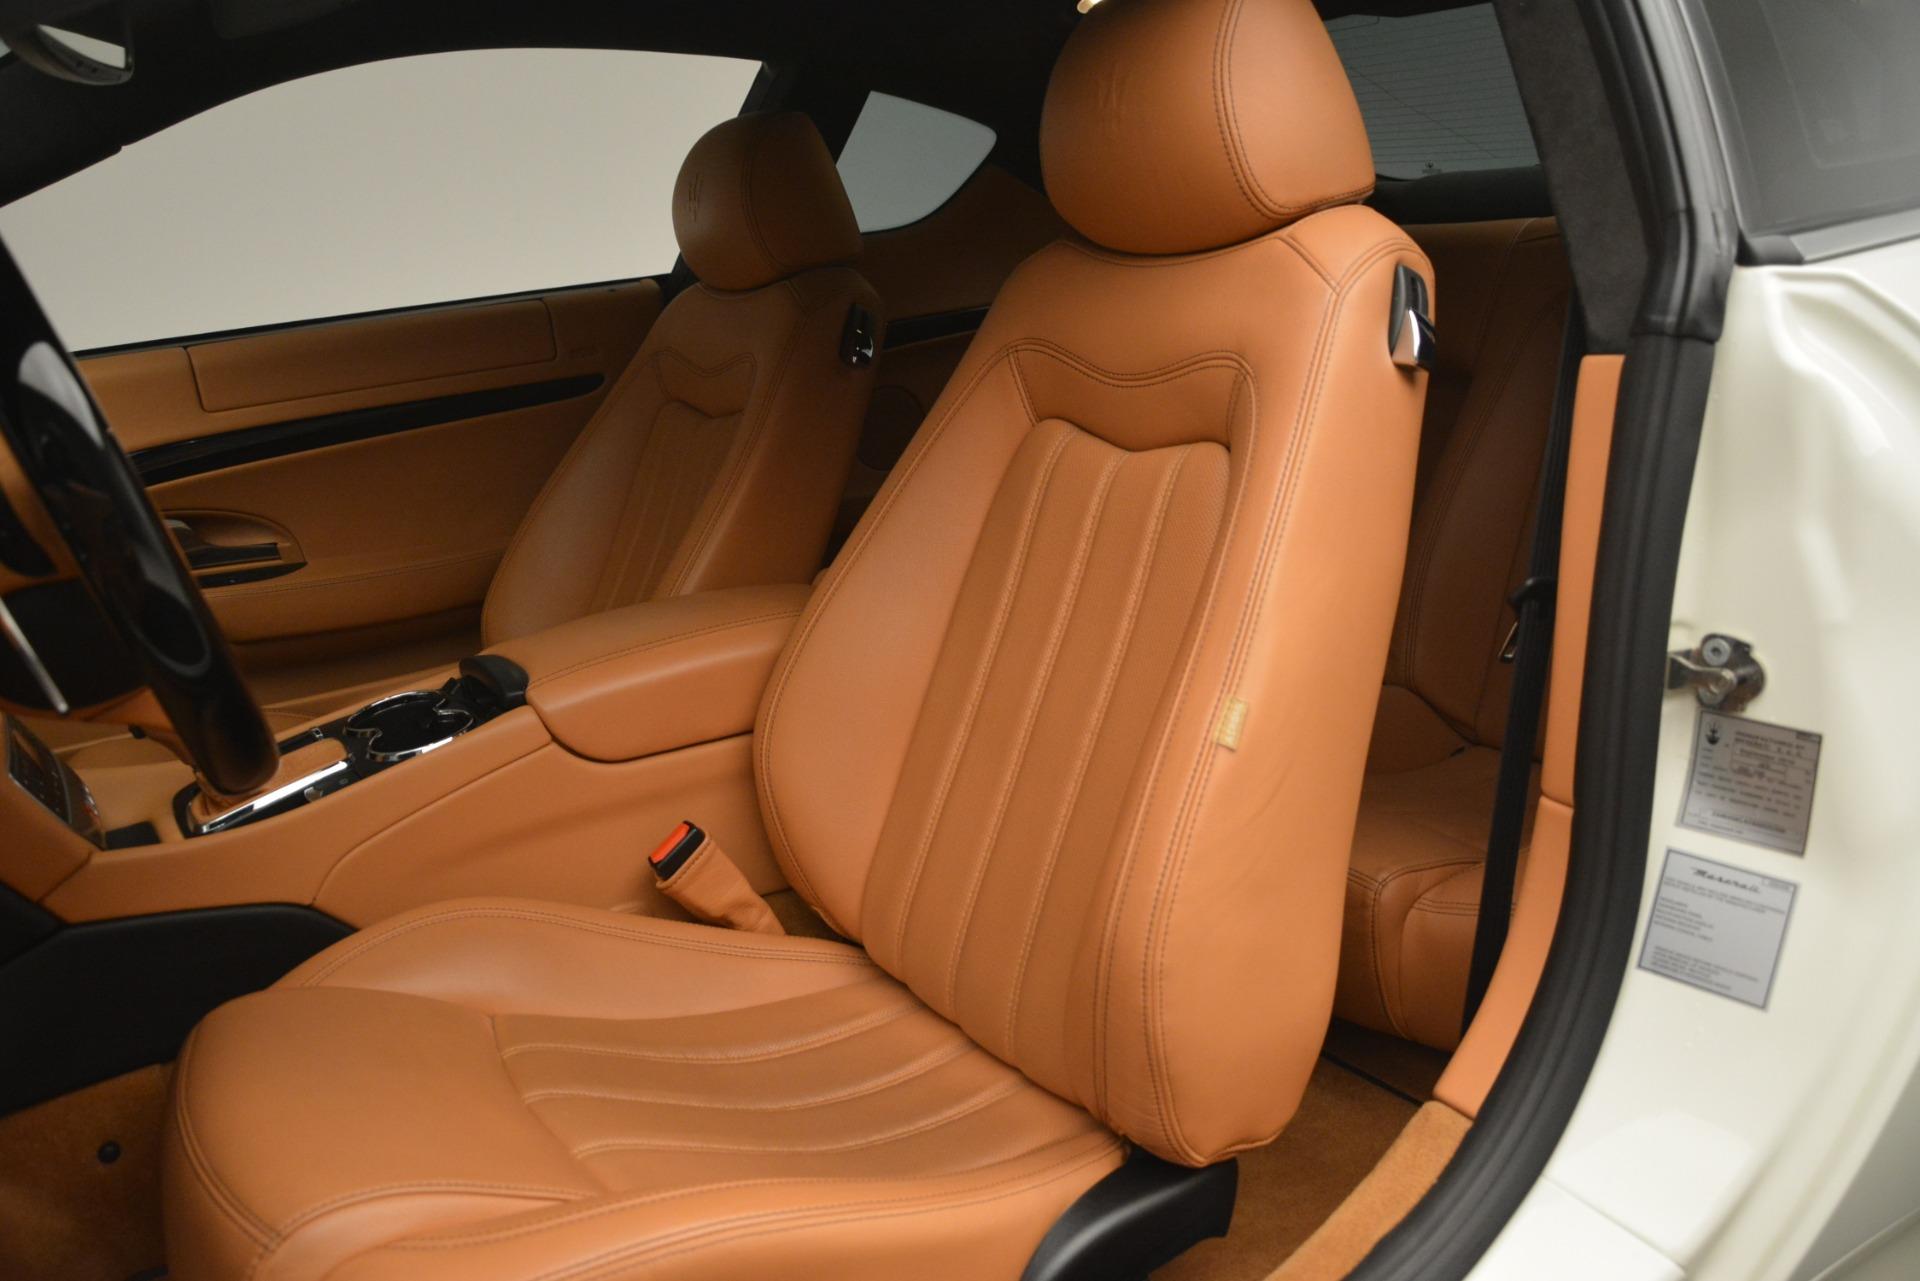 Used 2011 Maserati GranTurismo S Automatic For Sale In Westport, CT 3061_p15